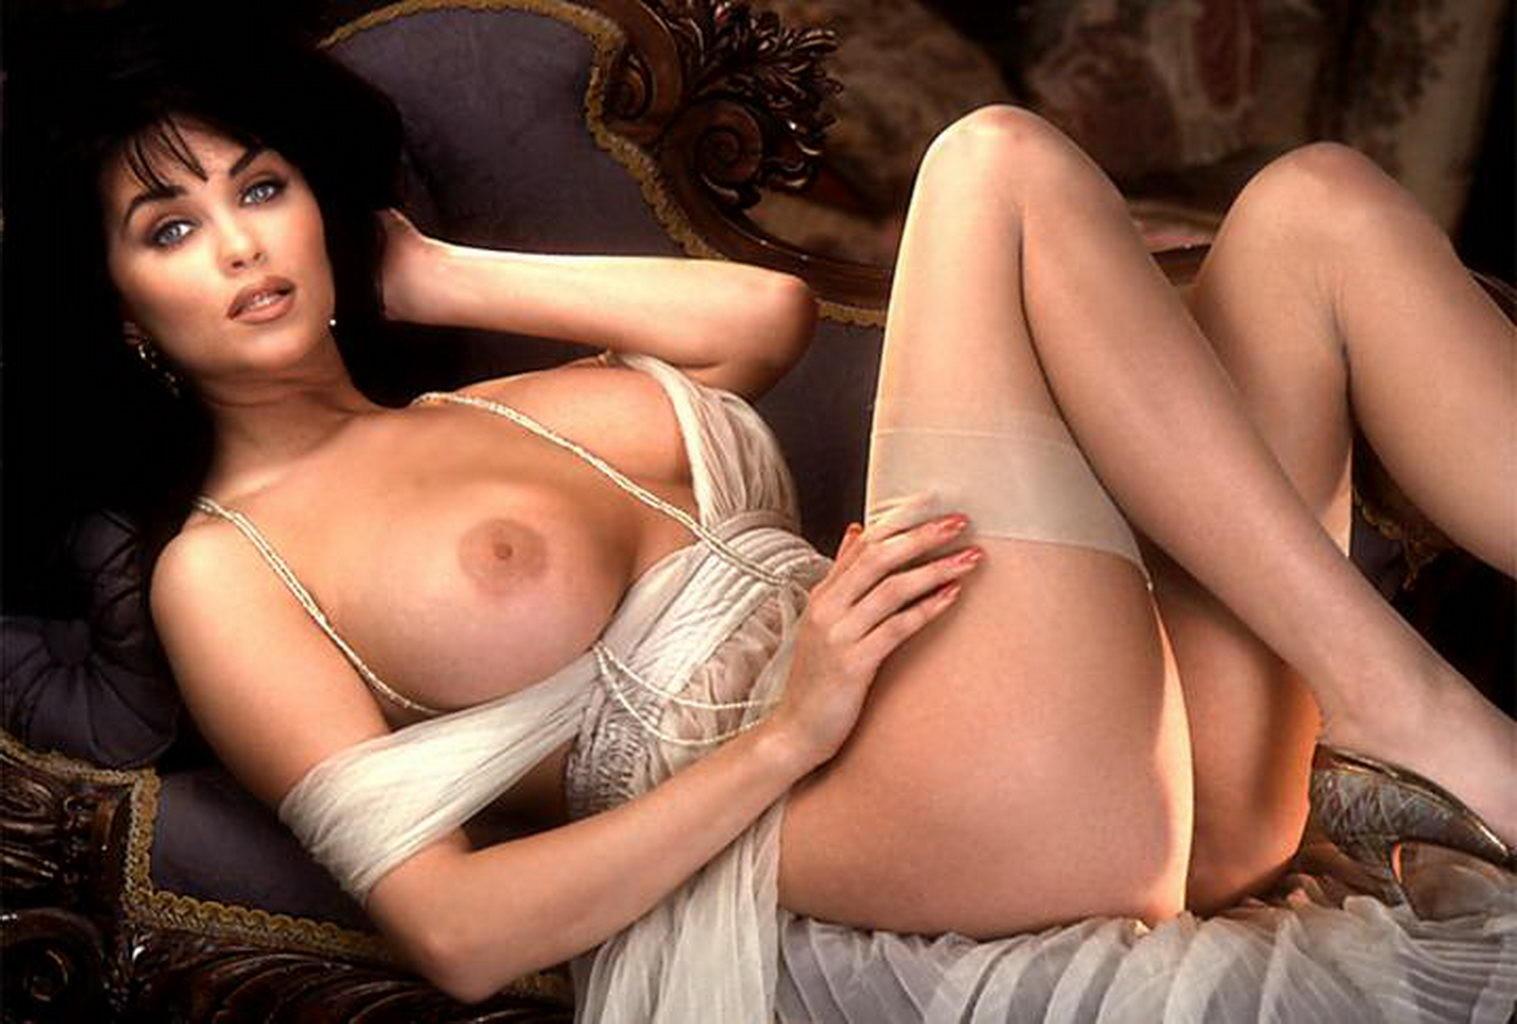 Miss July 1994 Traci Adell - Pichunter